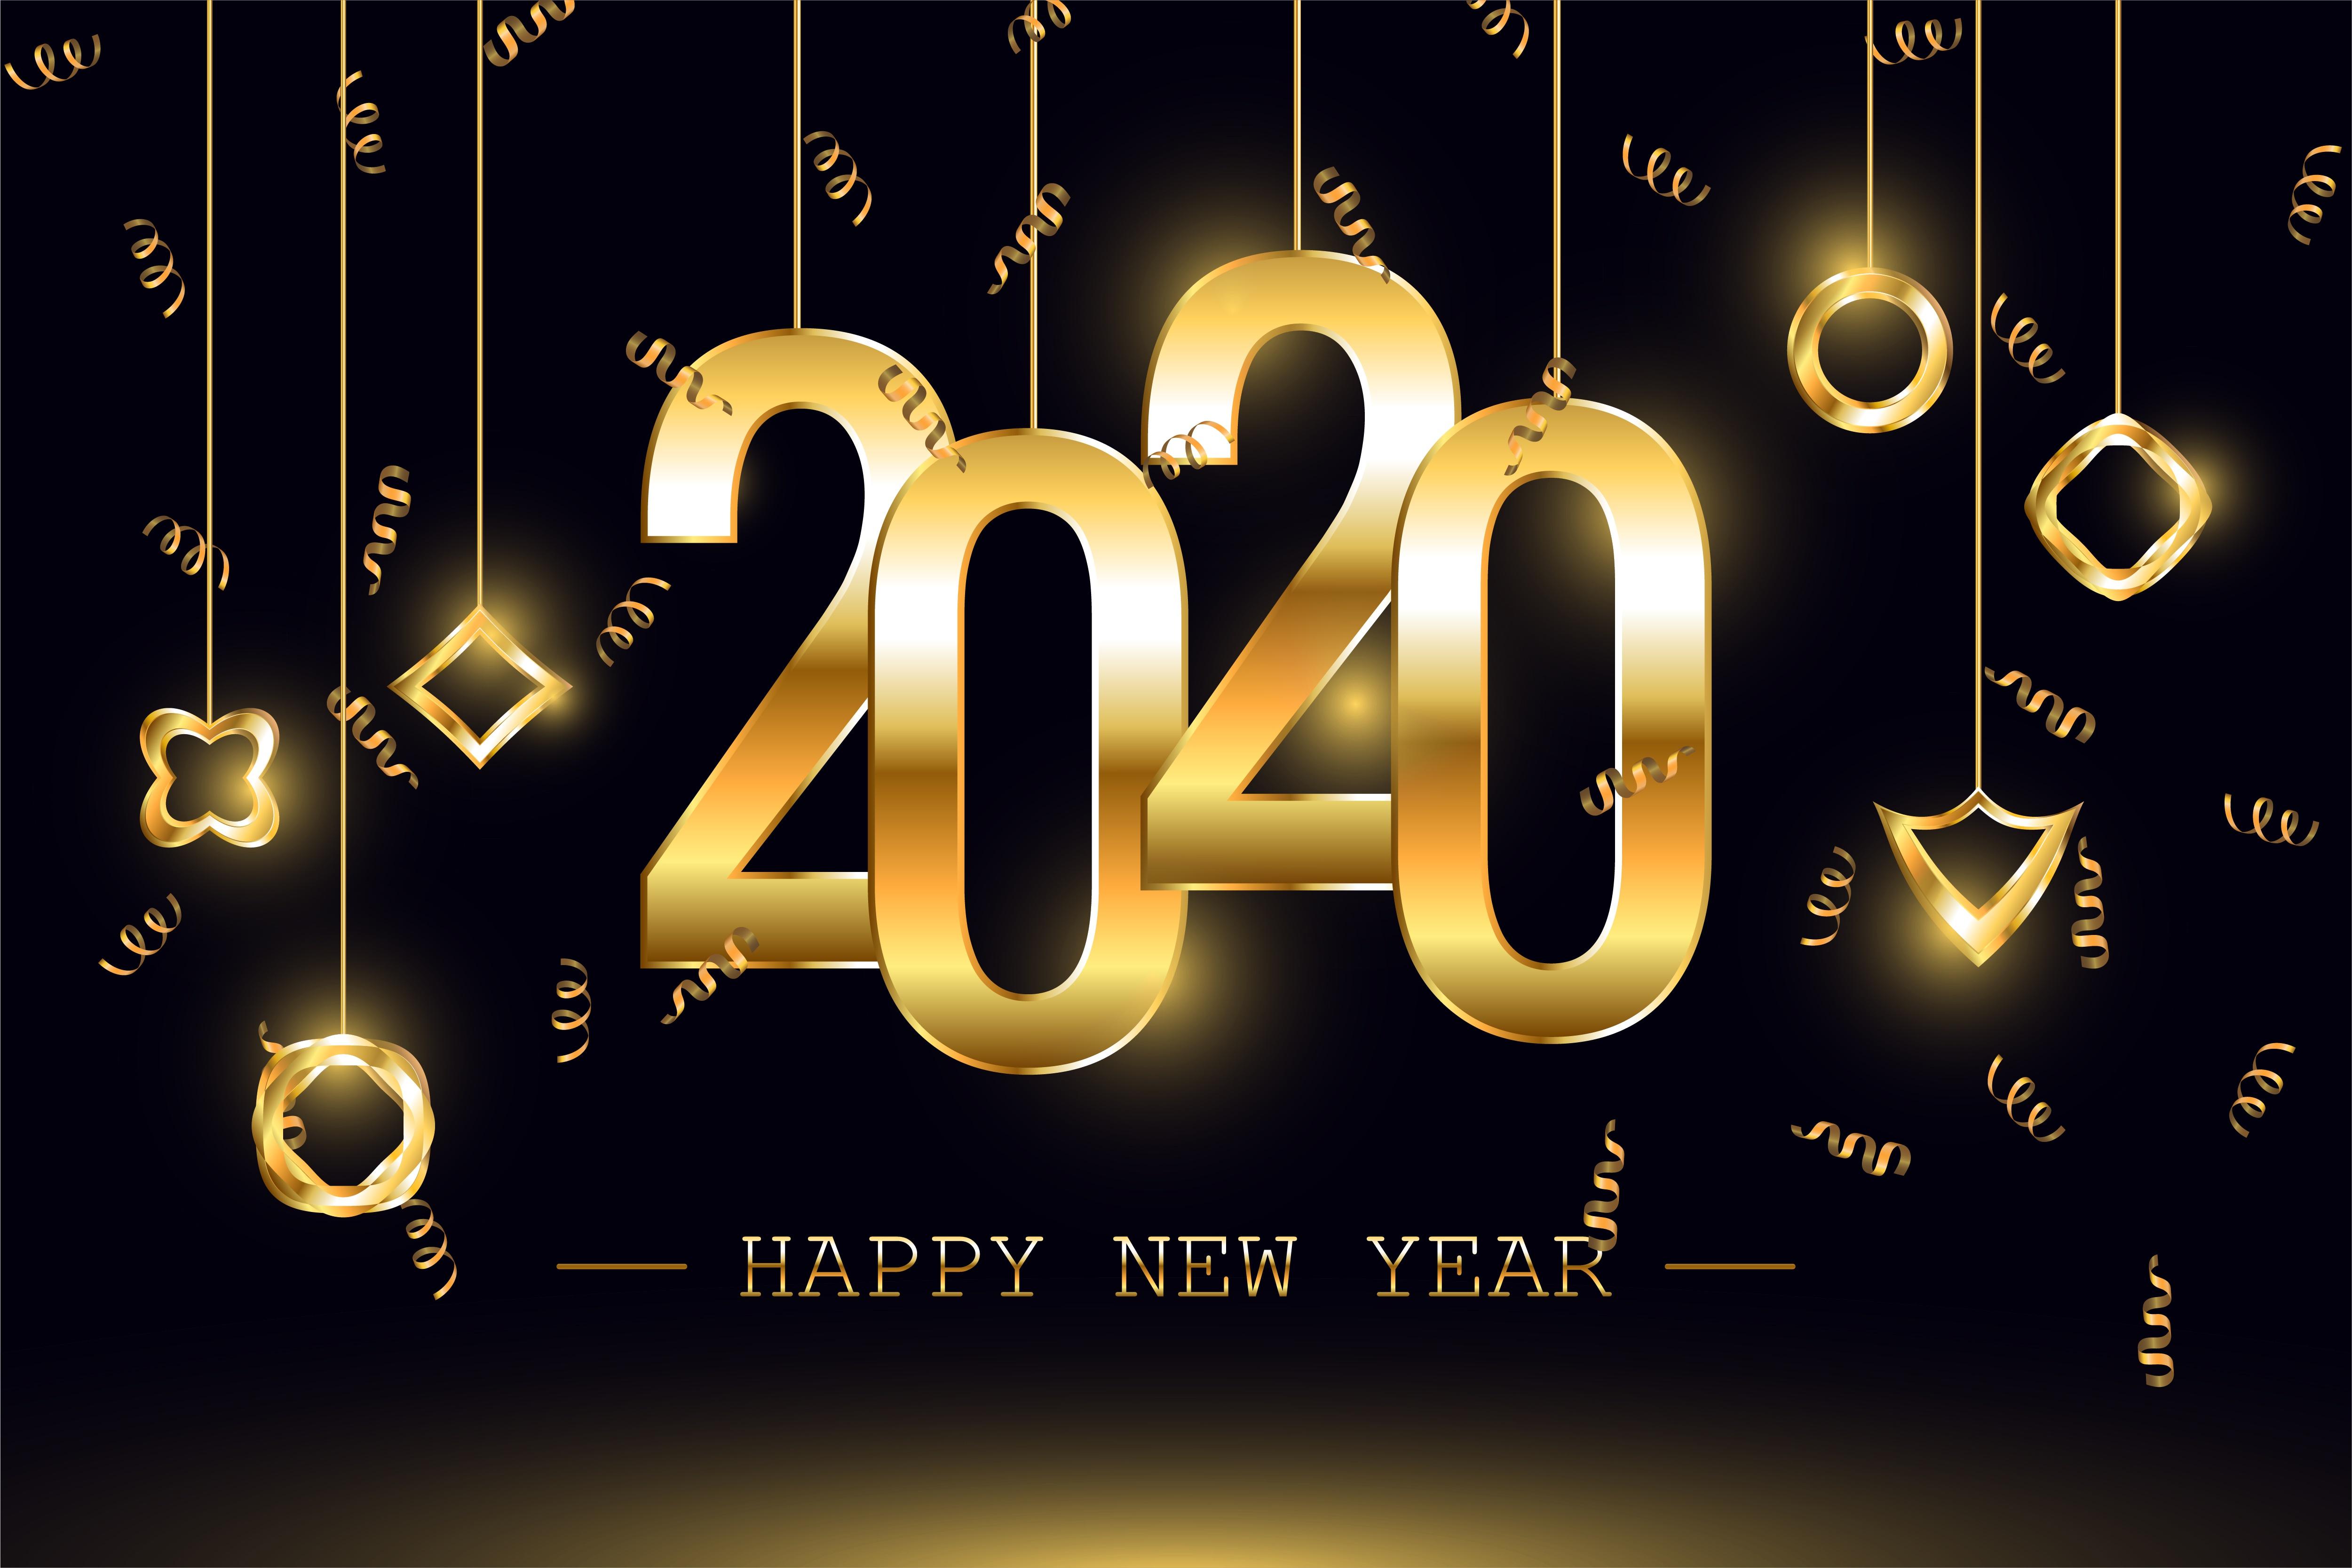 New Year 2020 4k Ultra HD Wallpaper Background Image 5001x3334 5001x3334